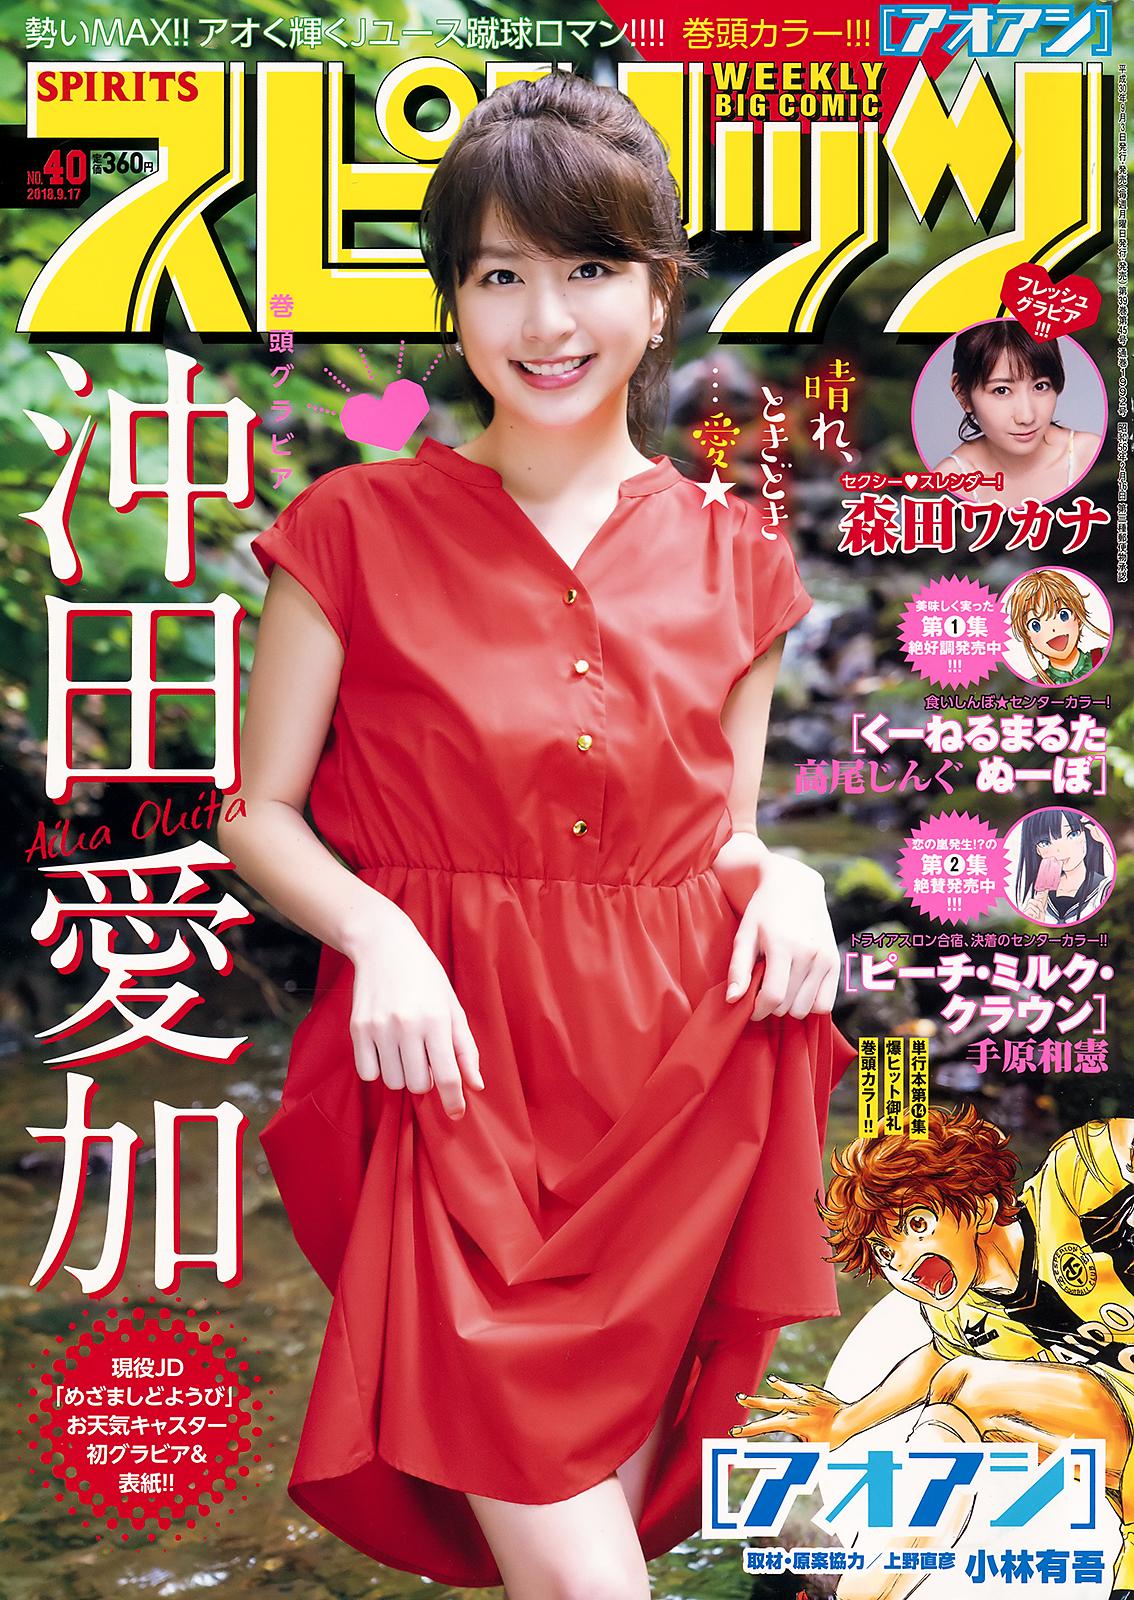 [Big Comic Spirits] 2018 No.40 (沖田愛加 森田ワカナ)